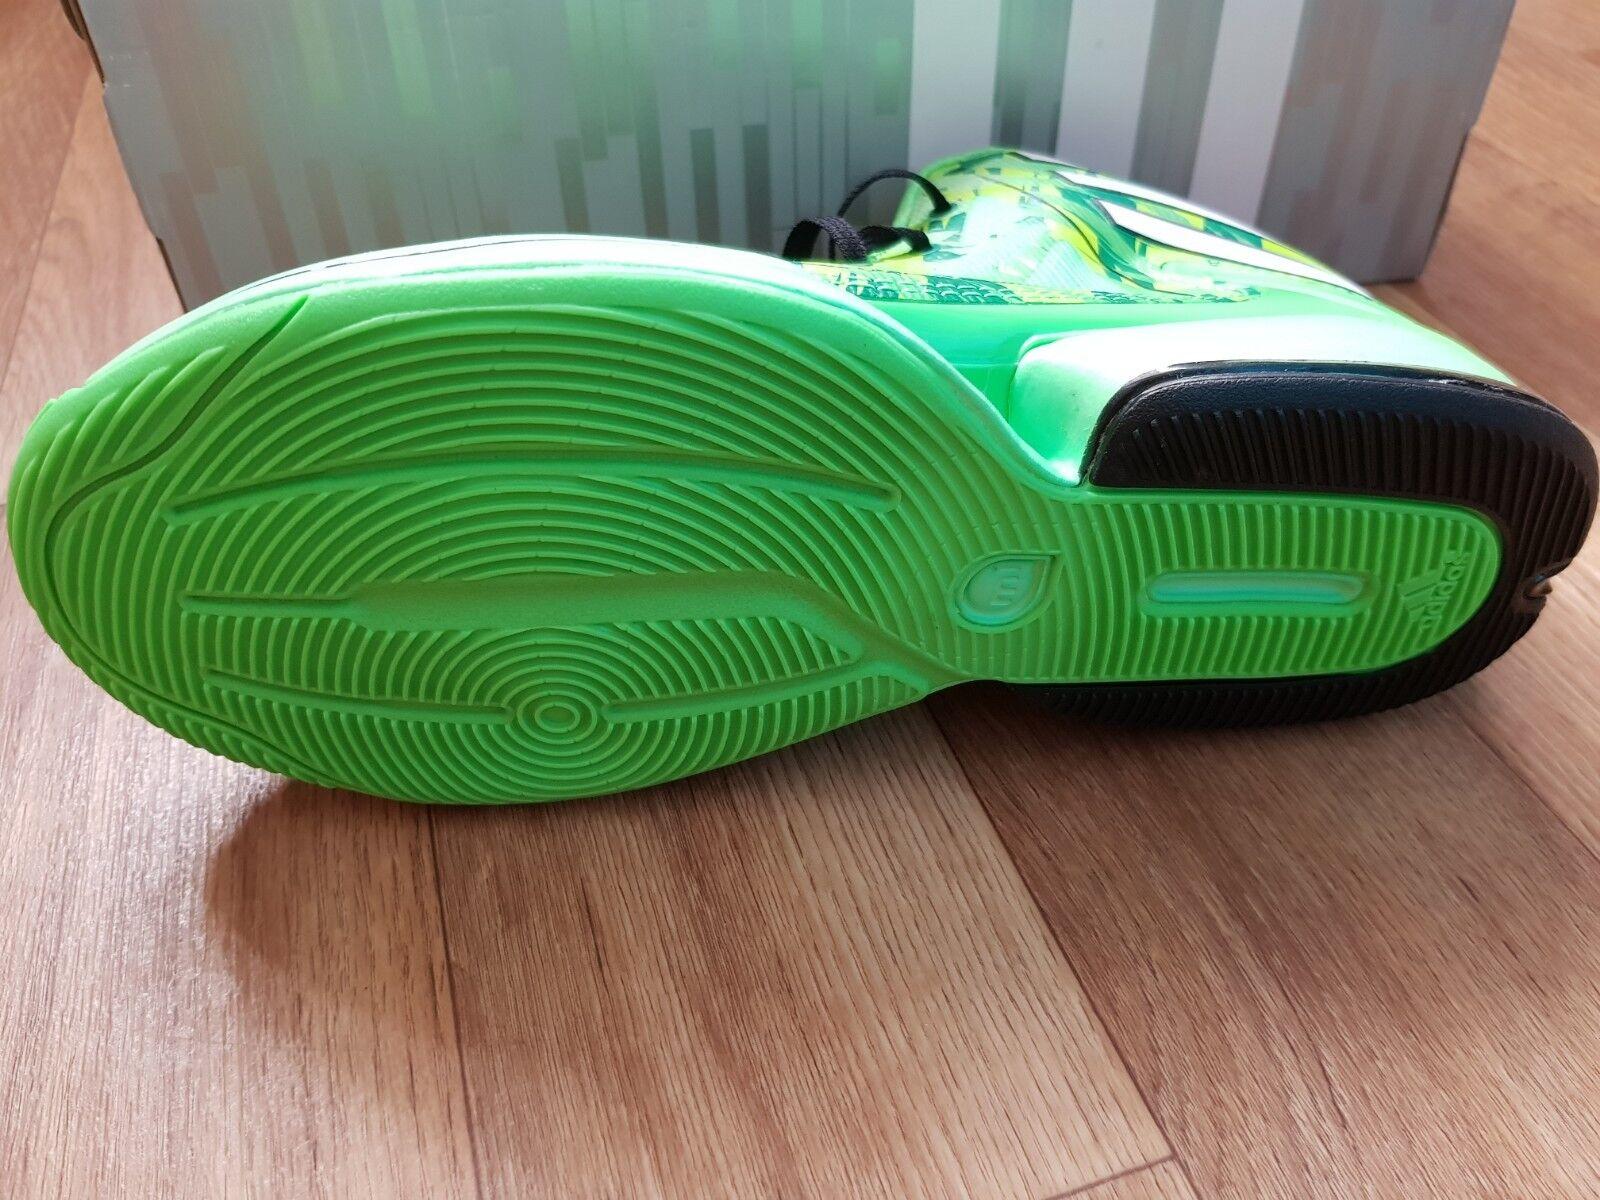 Adidas adizero crazy light Herren Basketballschuhe Stiefel Stiefel Stiefel gr. 42 neu 0636ab